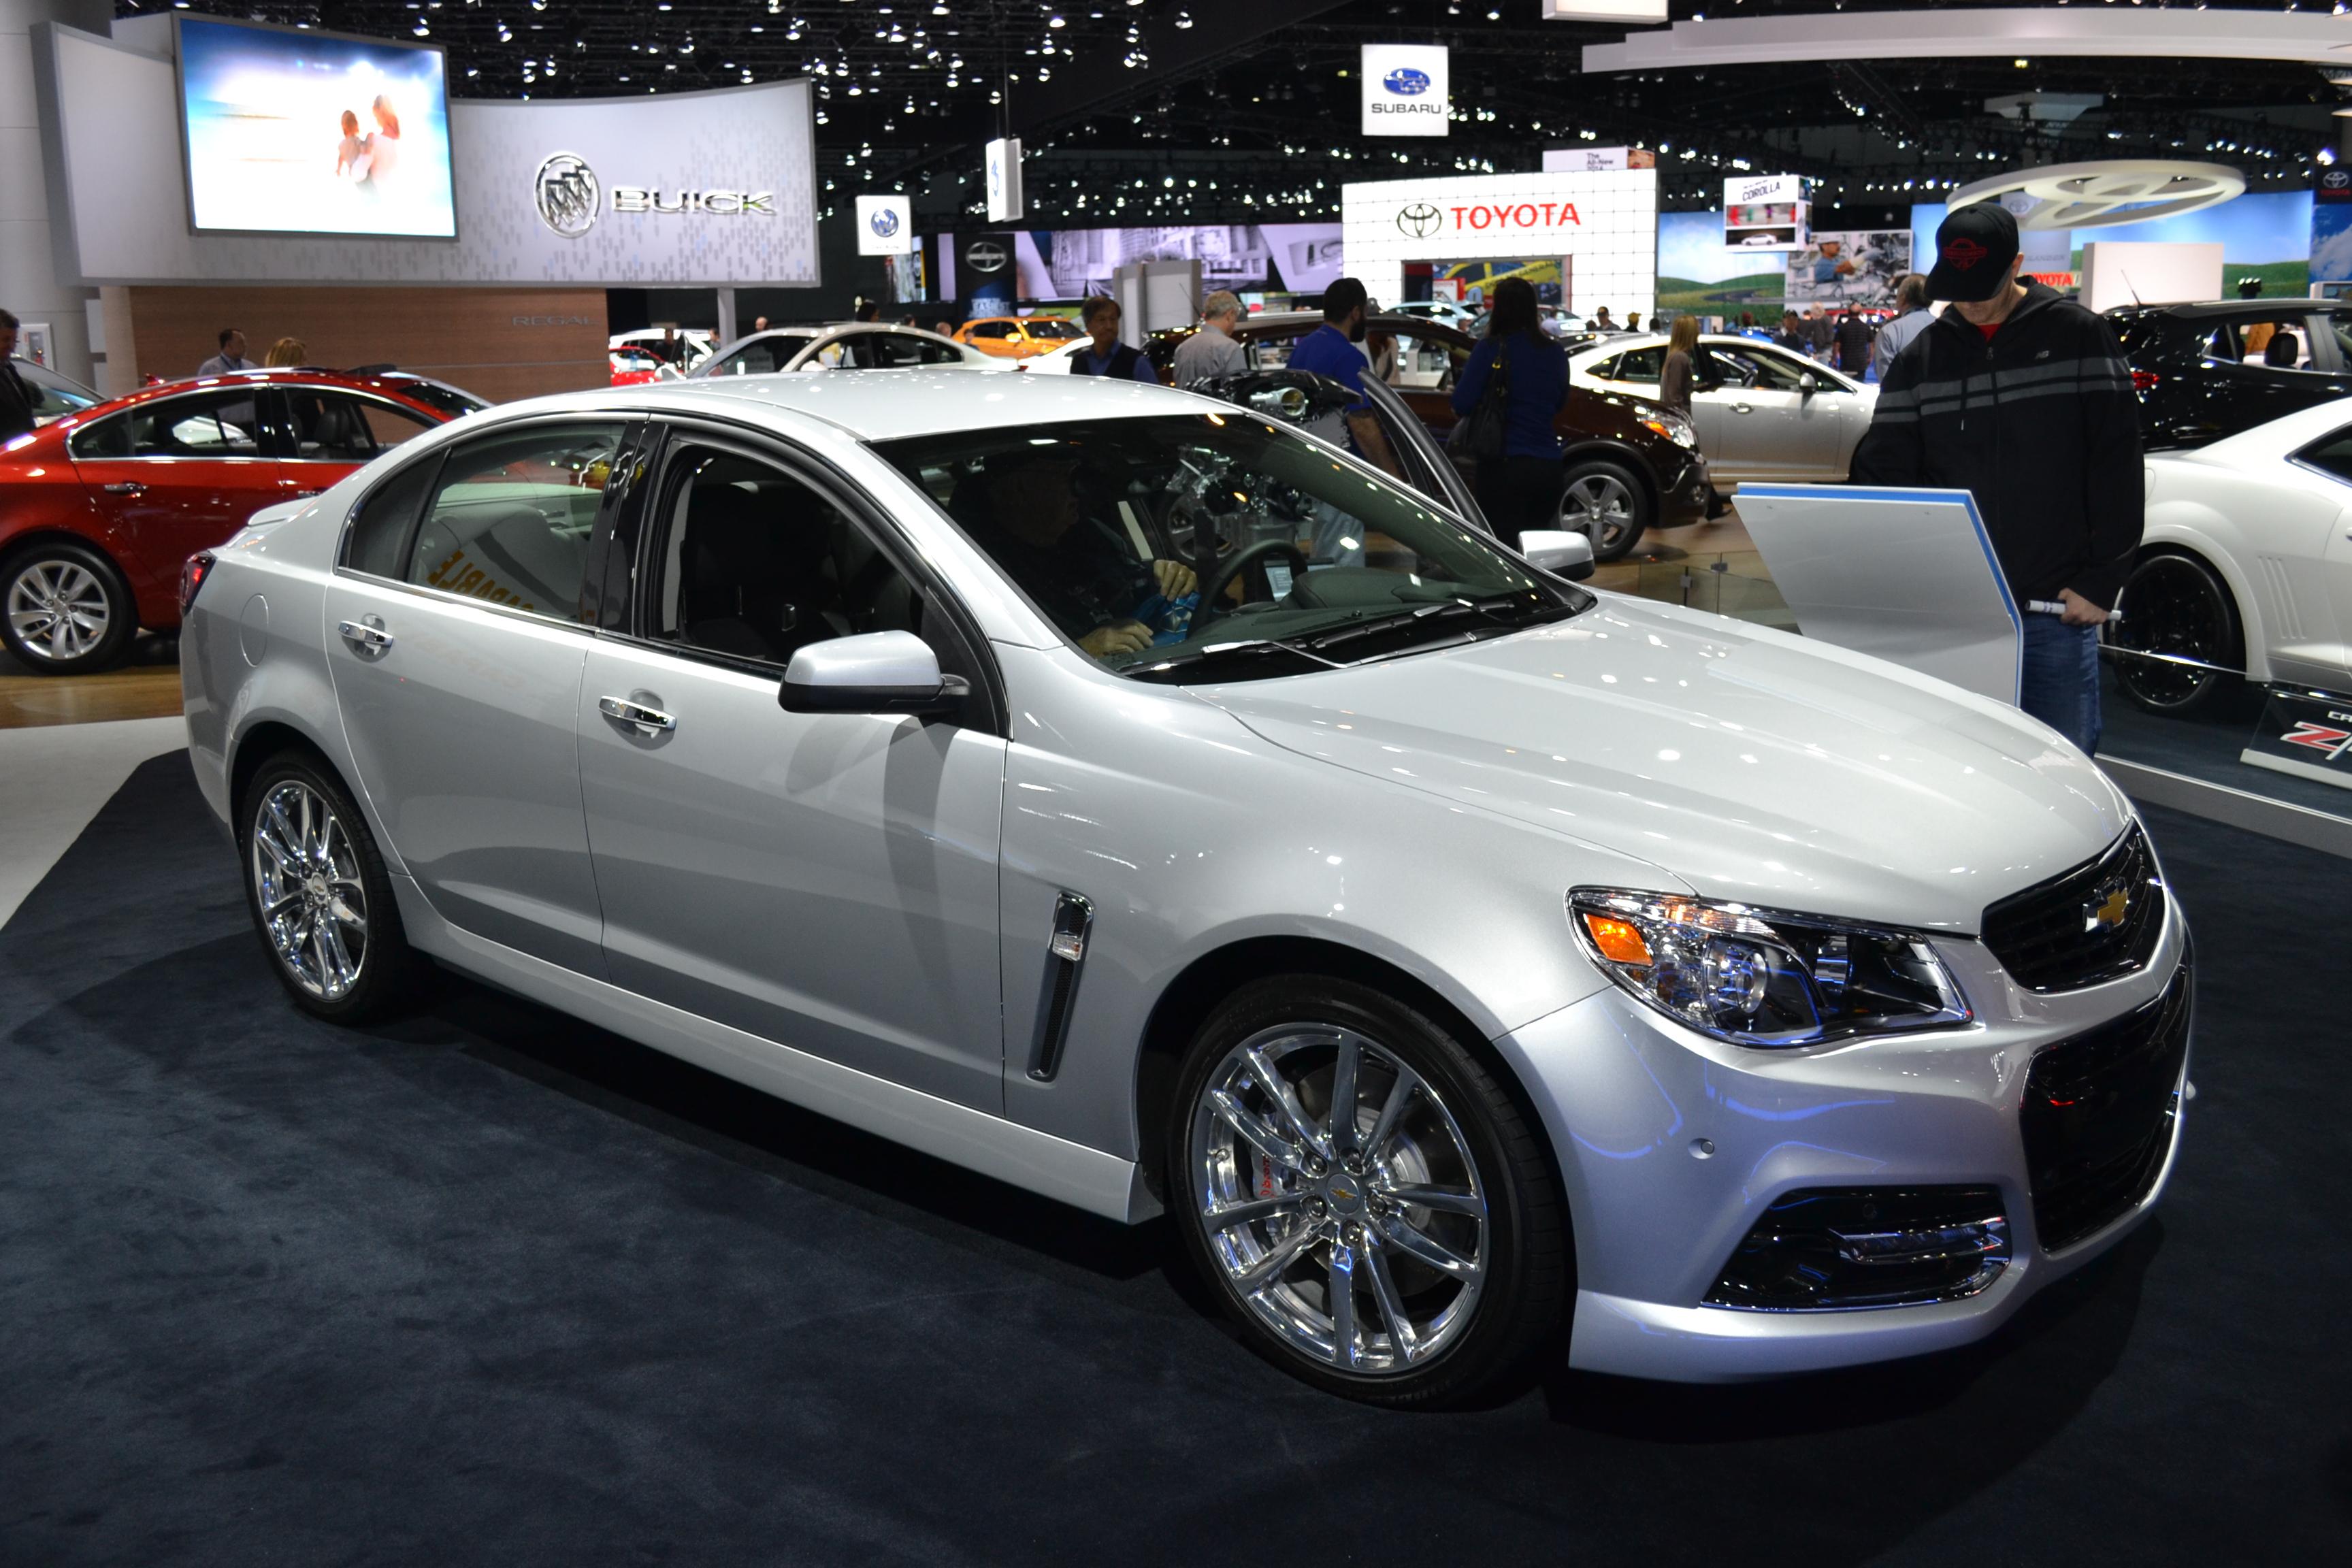 2015 Chevrolet Malibu LS VIN Number Search - AutoDetective